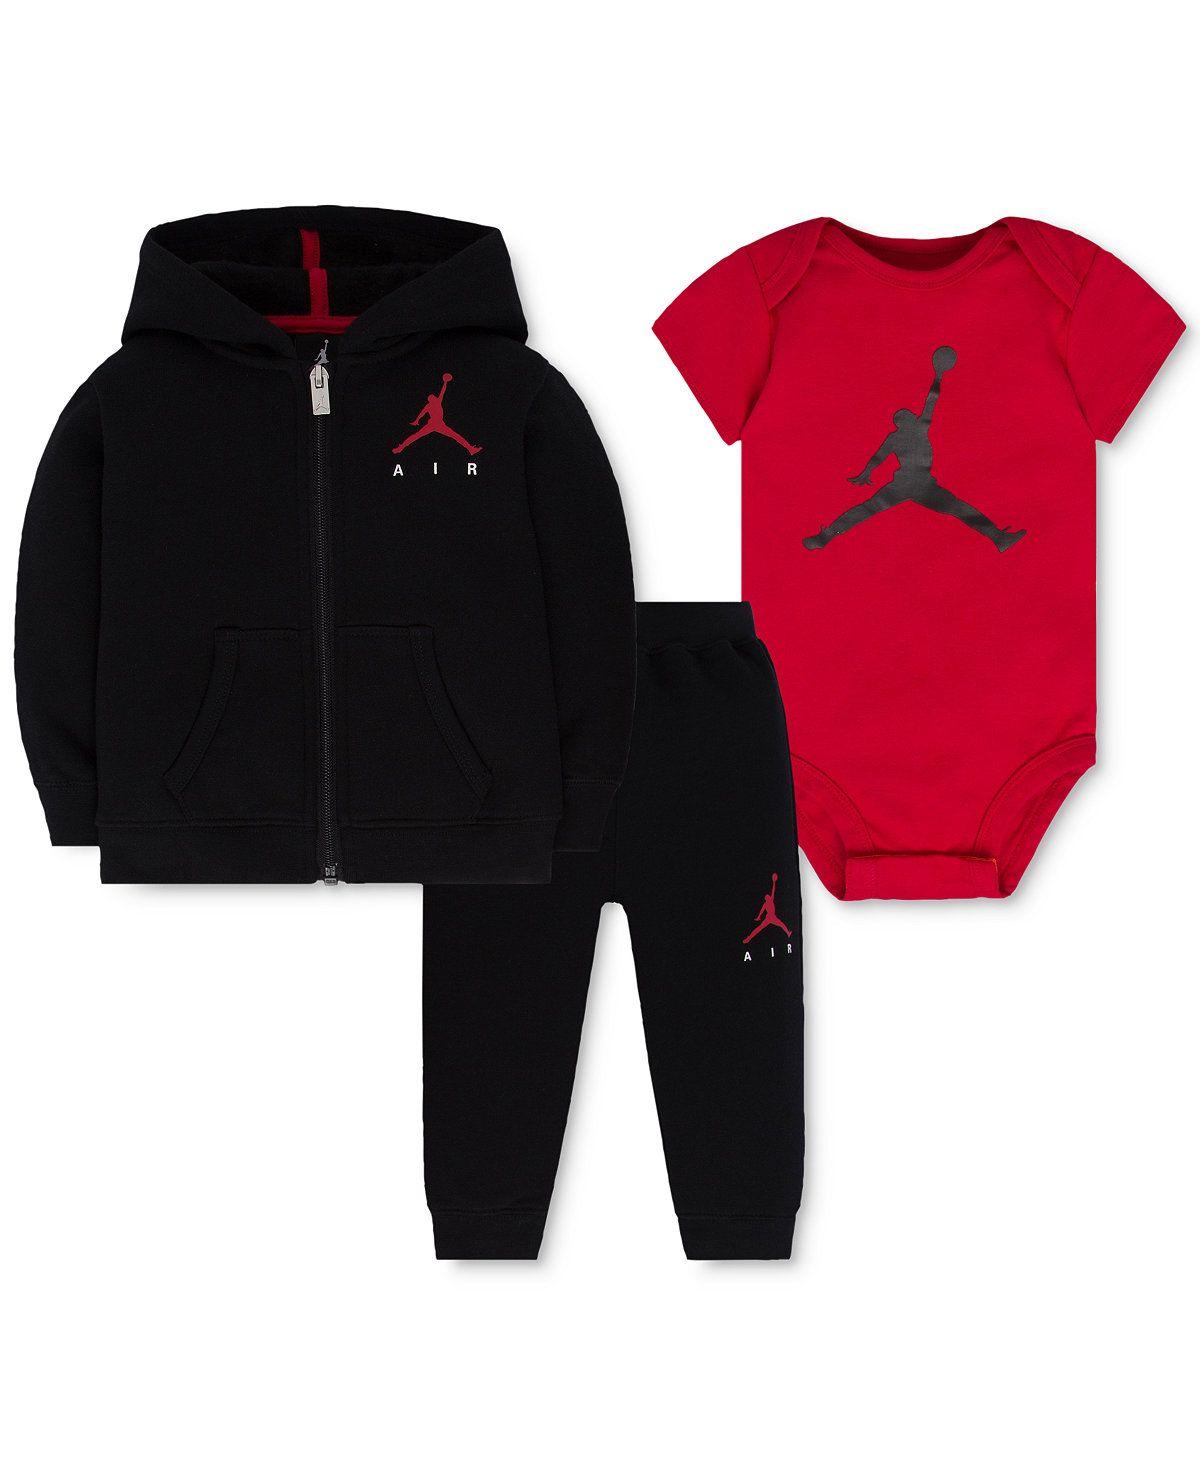 5449ac903 Jordan Baby Boys' 3-Pc. Air Fleece Hoodie, Bodysuit & Pants Set - Sets &  Outfits - Kids & Baby - Macy's